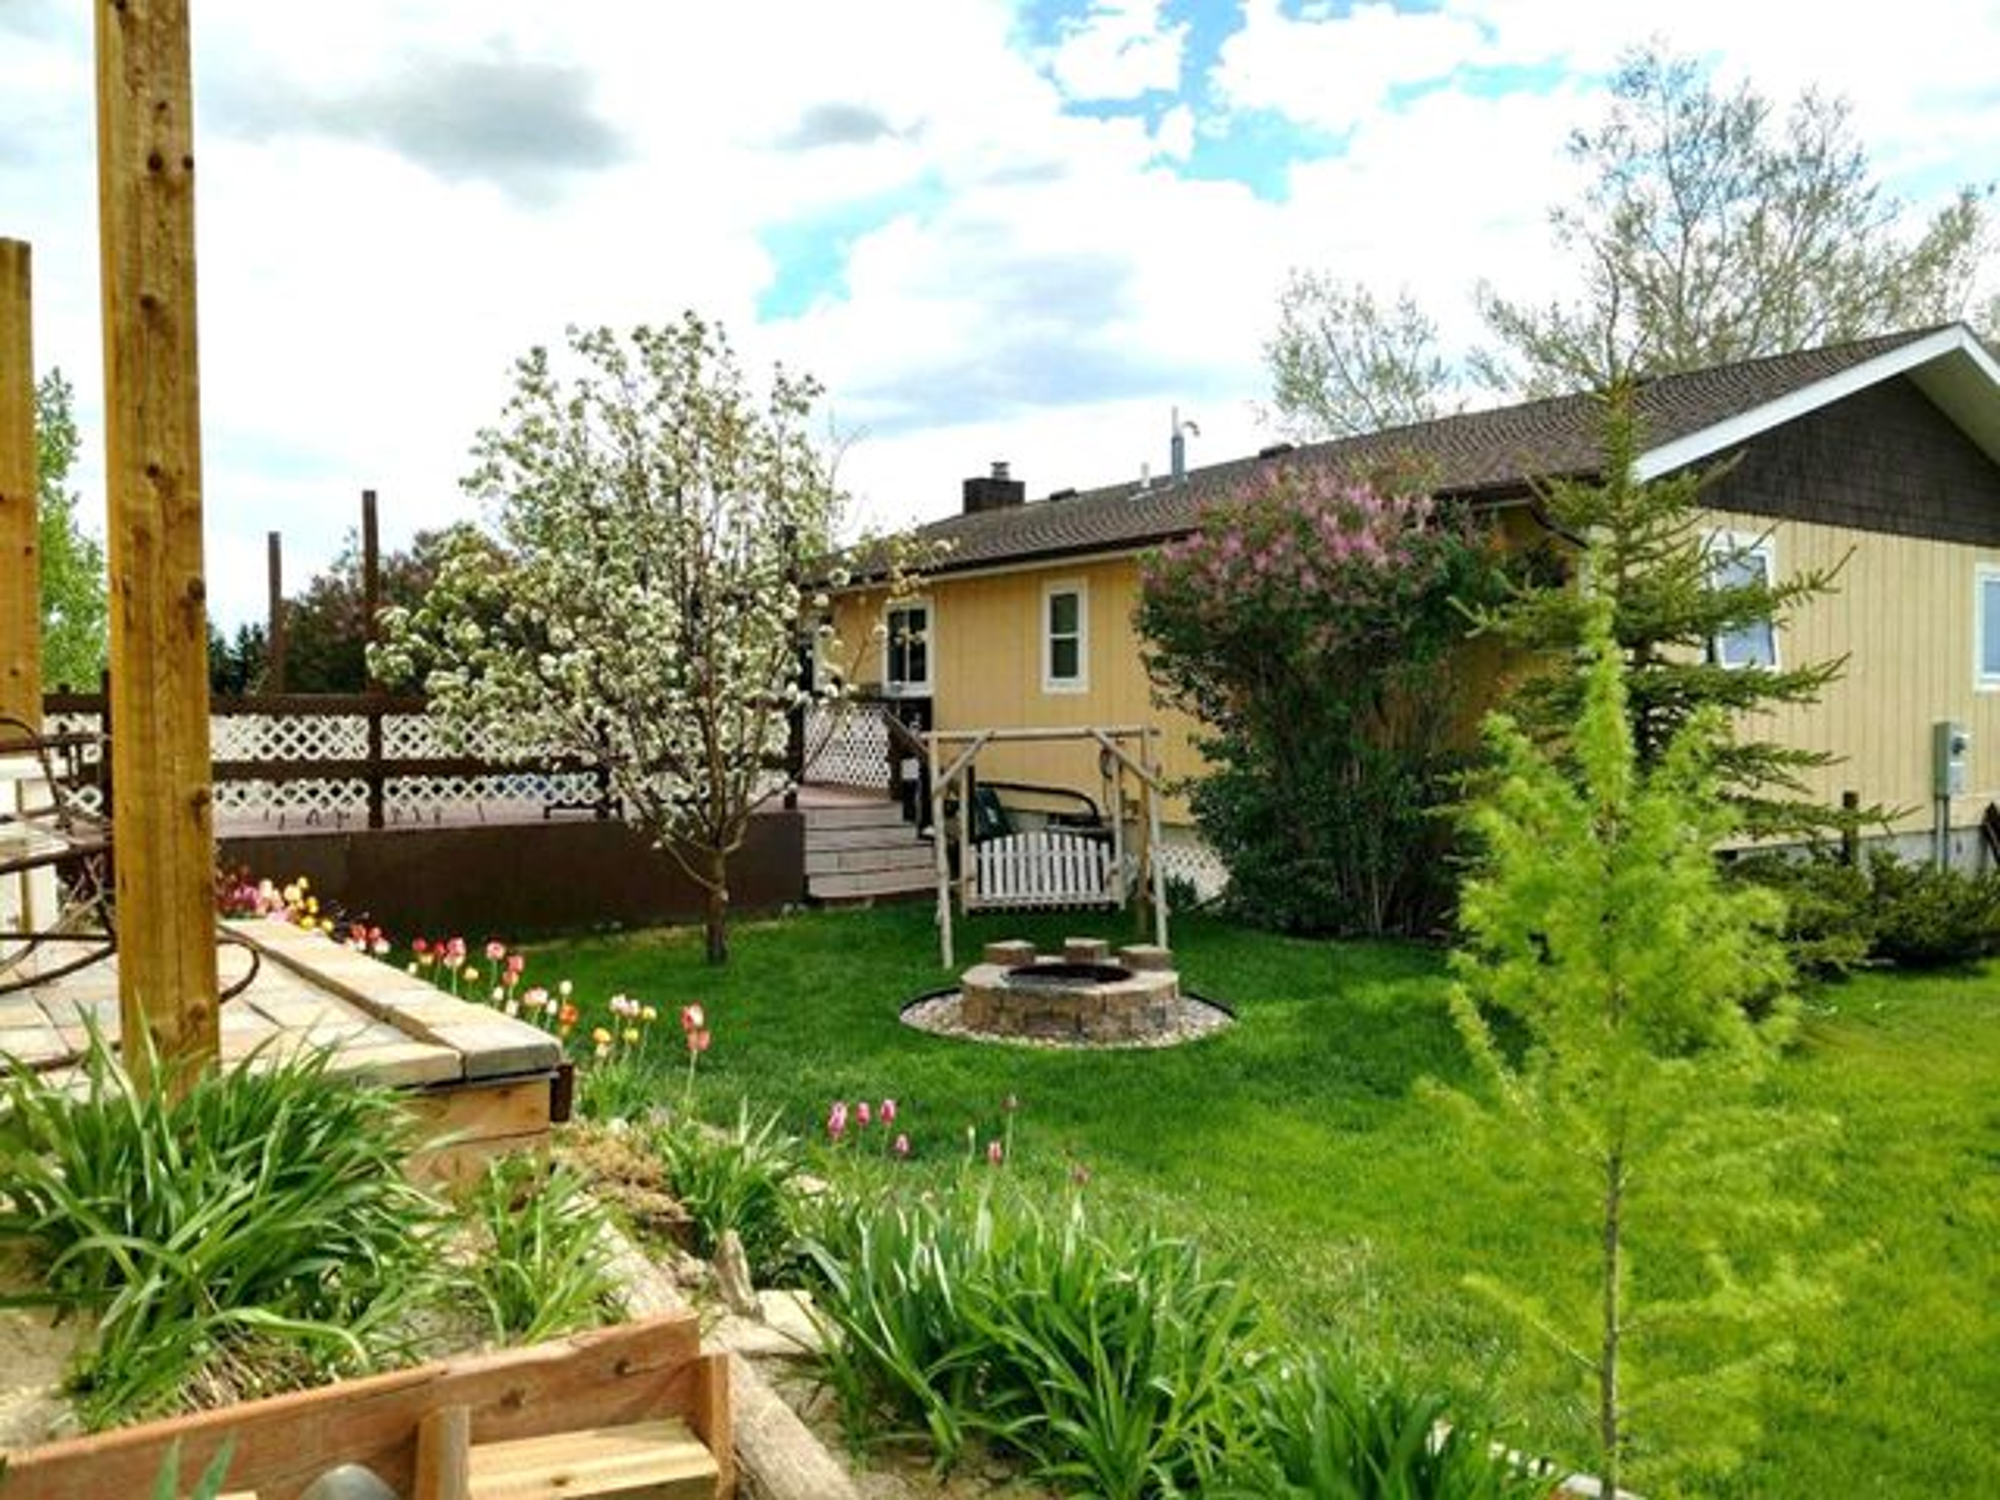 309 11th Avenue N E, Choteau, MT 59422